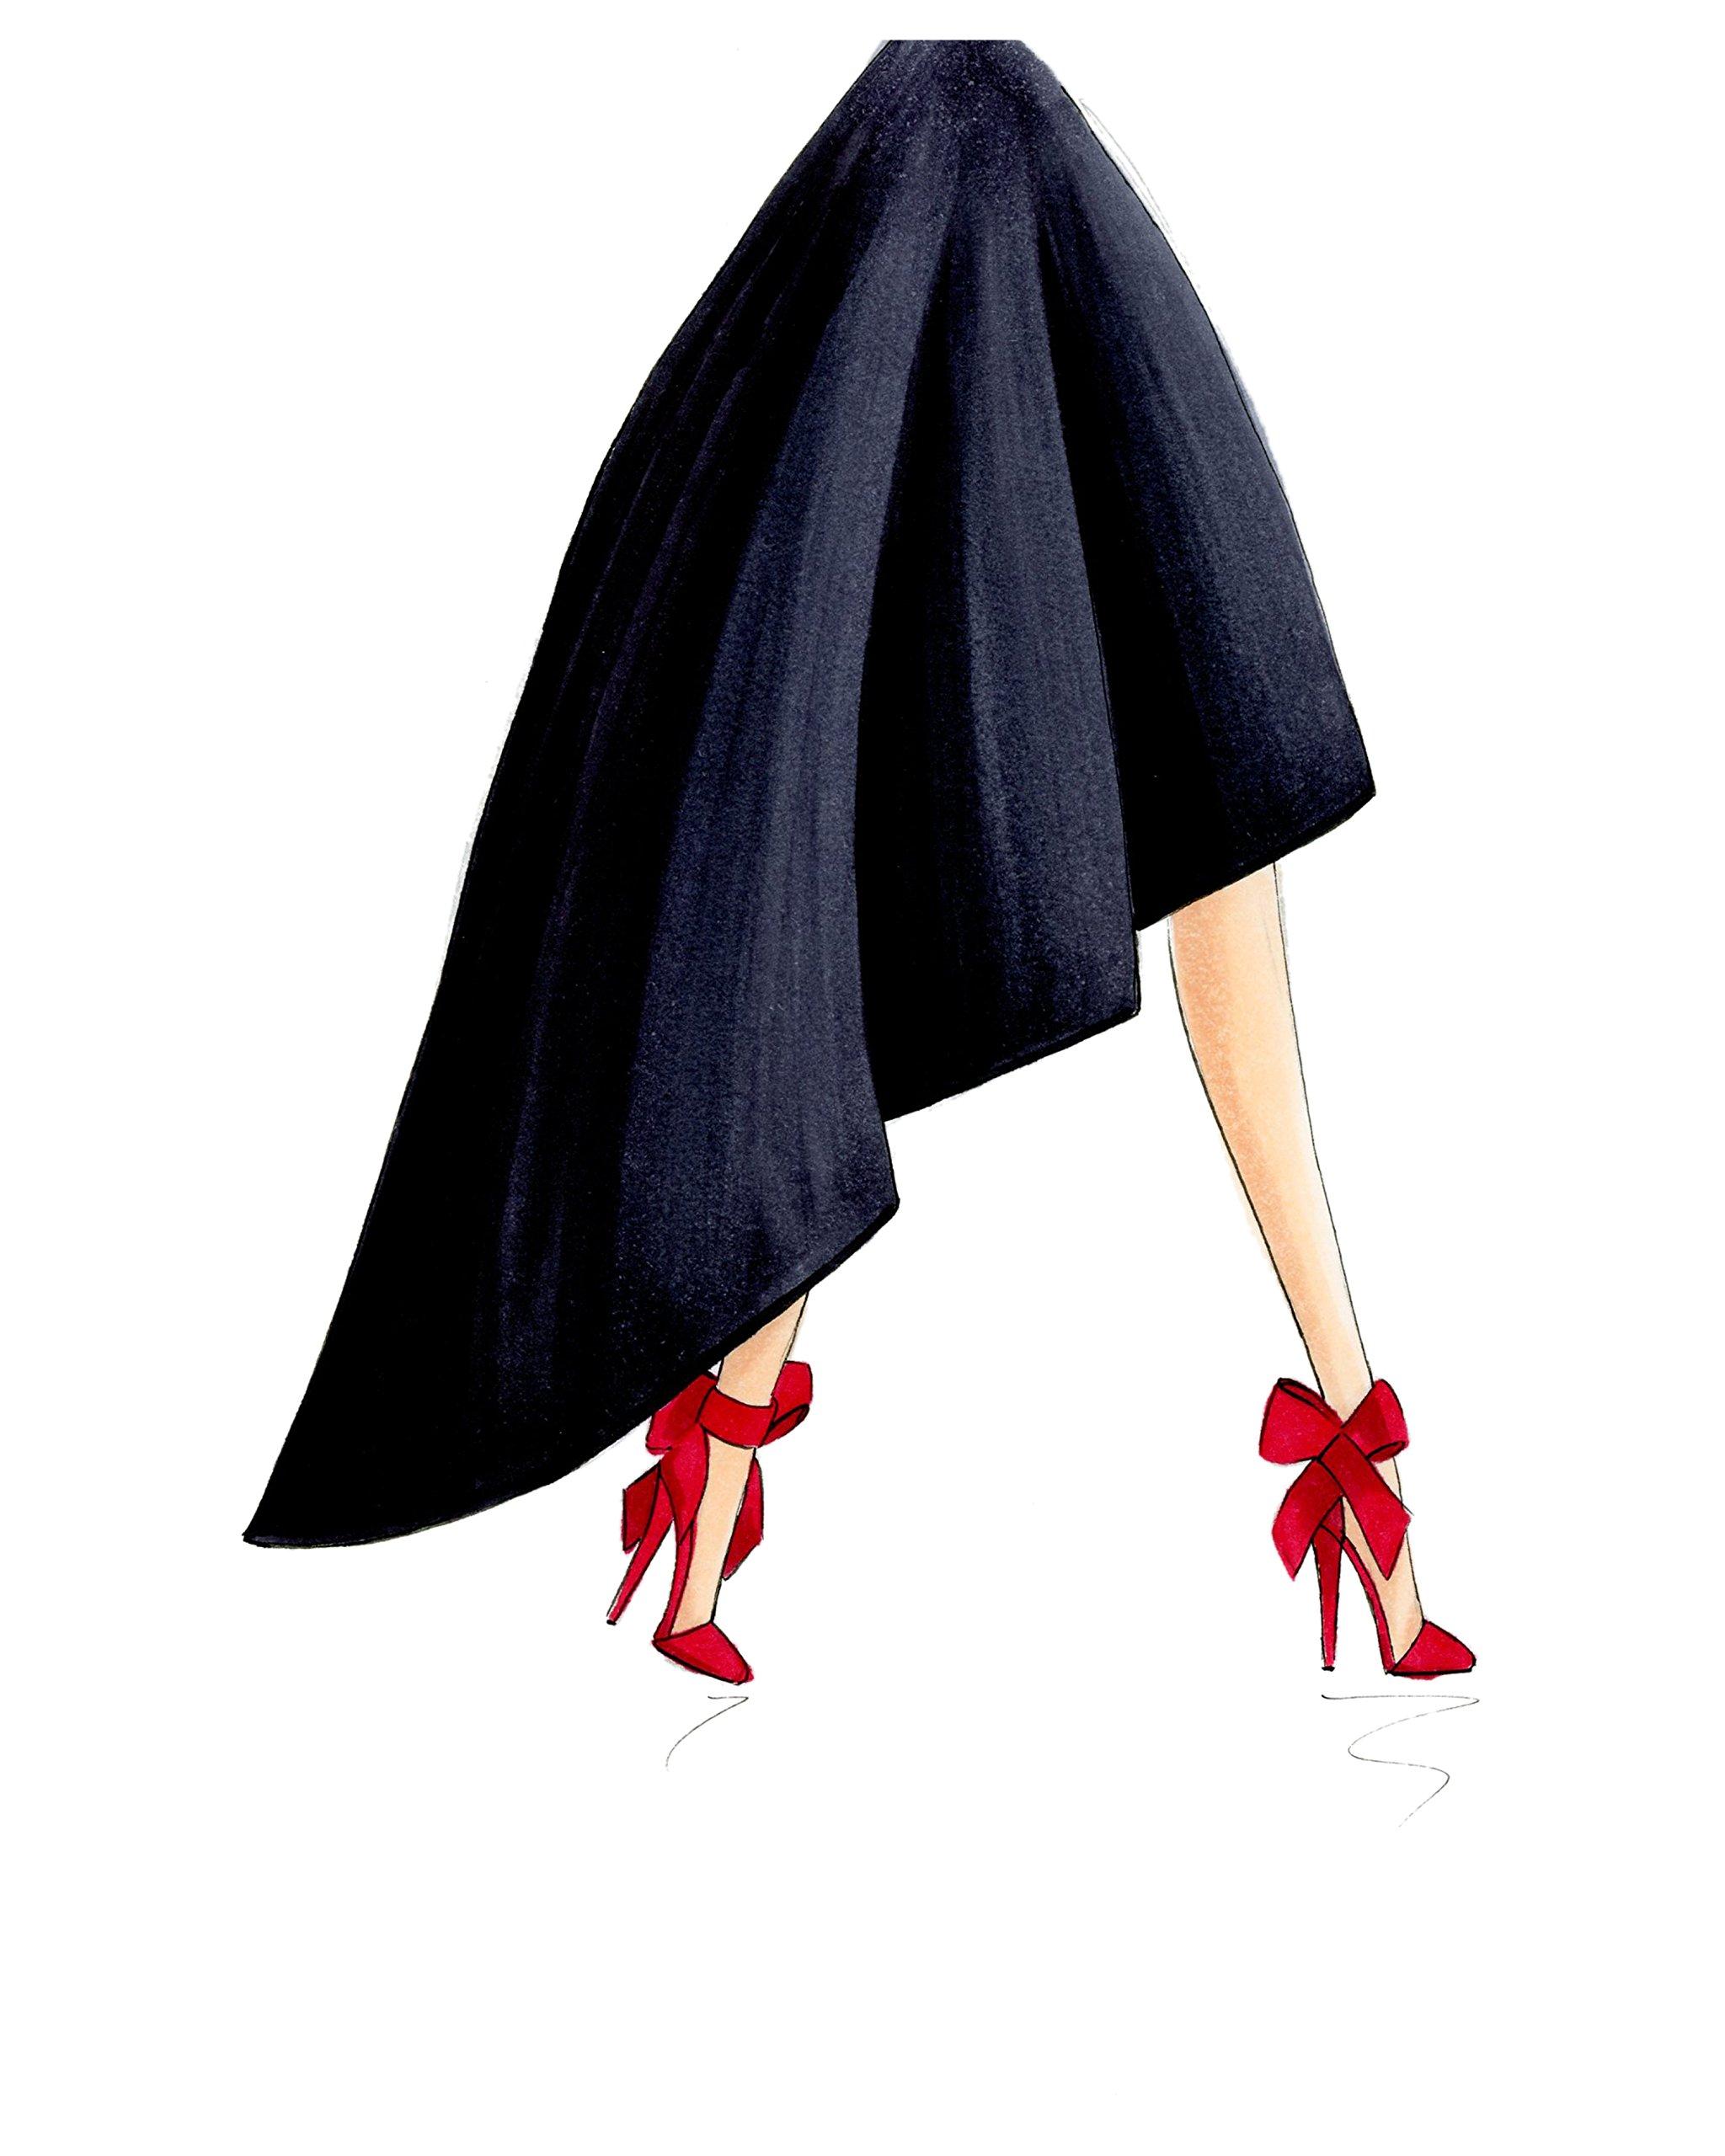 Red Bow Stilettos Fashion Illustration Art Print by De Almeida Illustrations